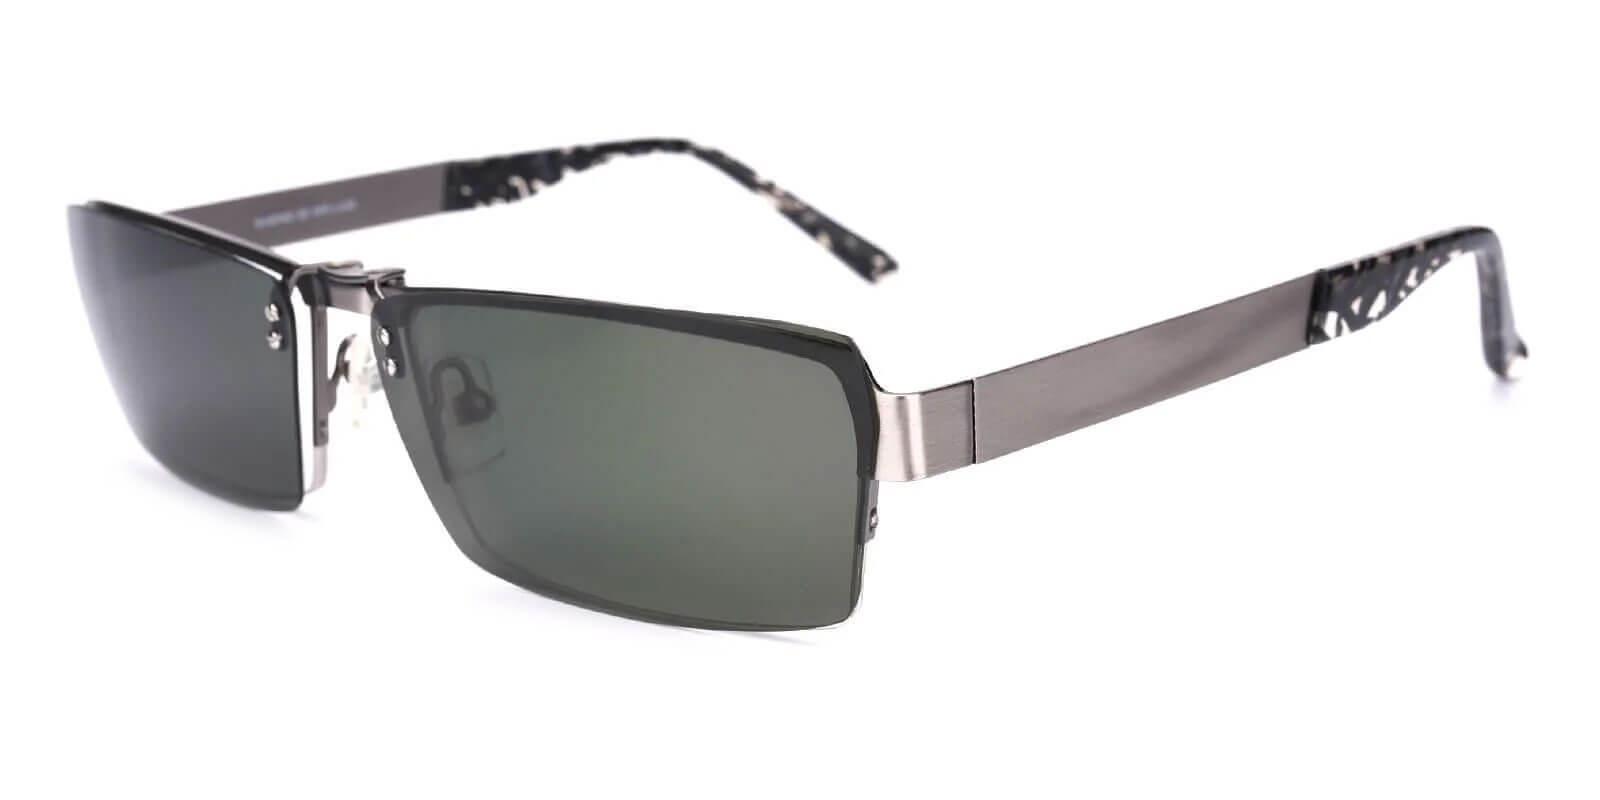 Bedford Silver Metal Eyeglasses , NosePads Frames from ABBE Glasses